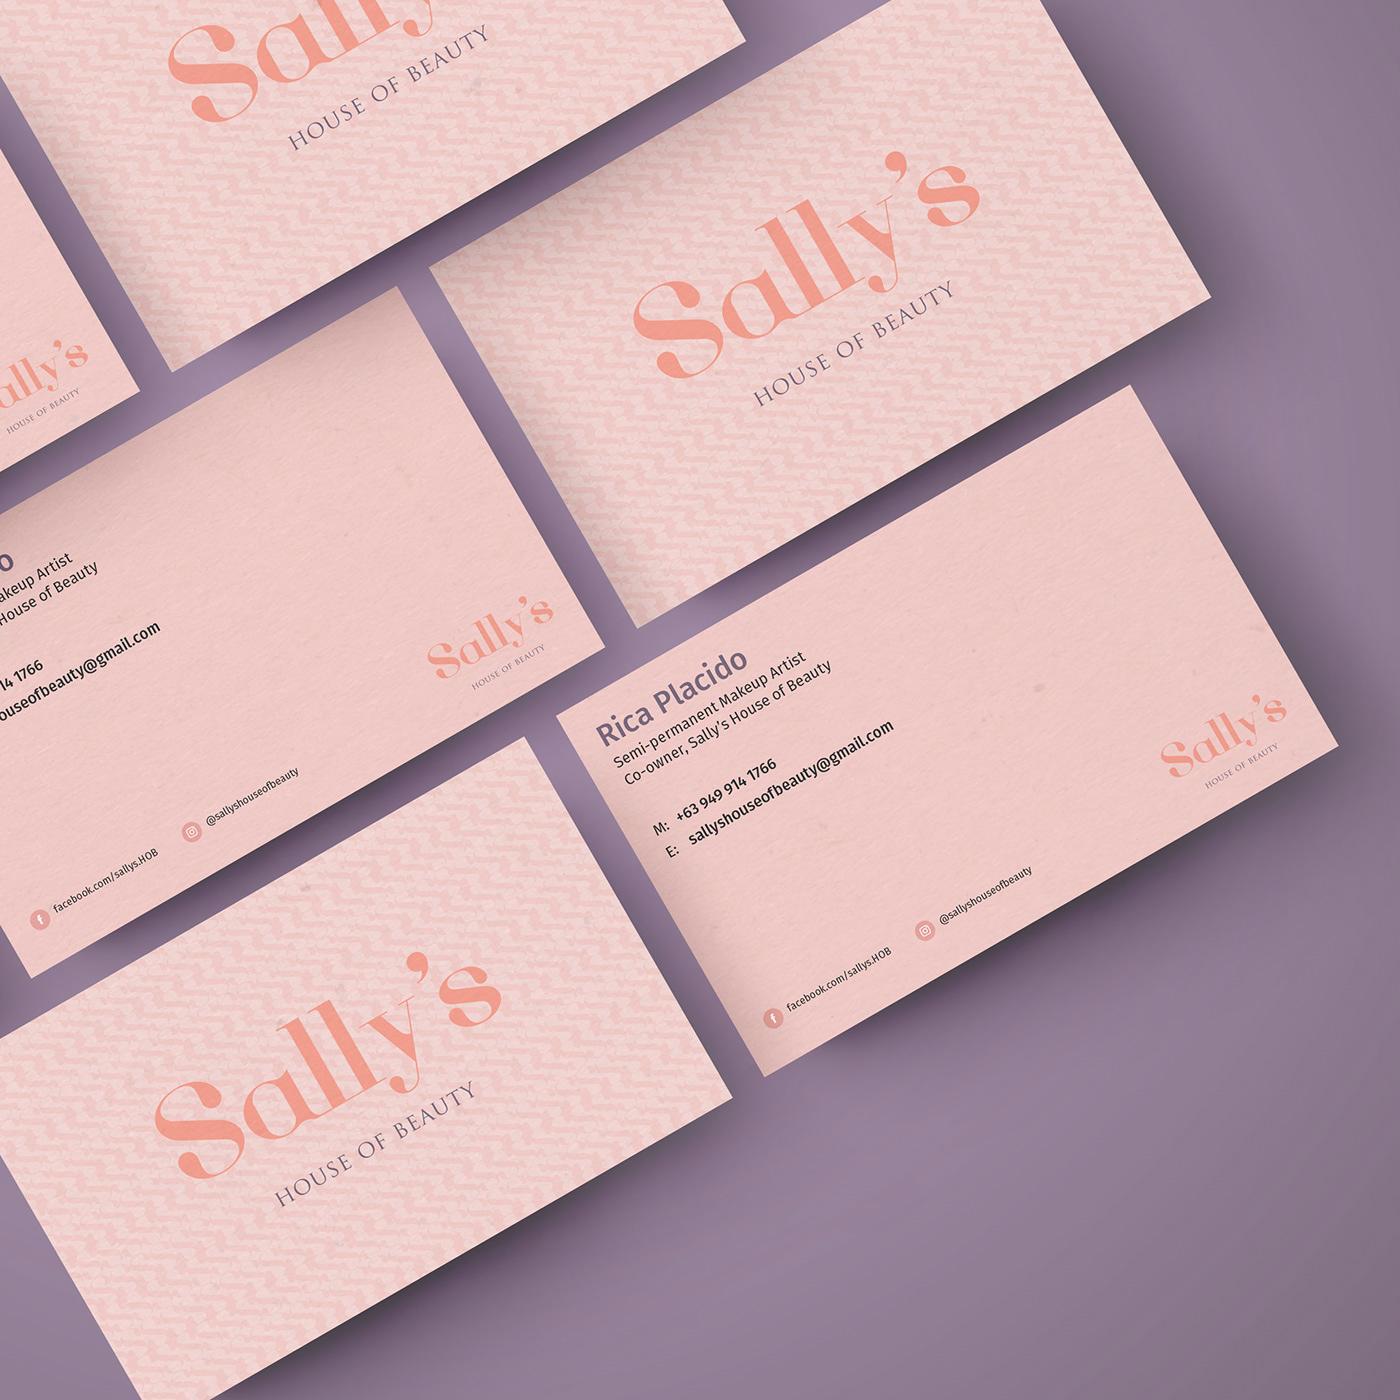 Sallys House Of Beauty Part 3 On Behance